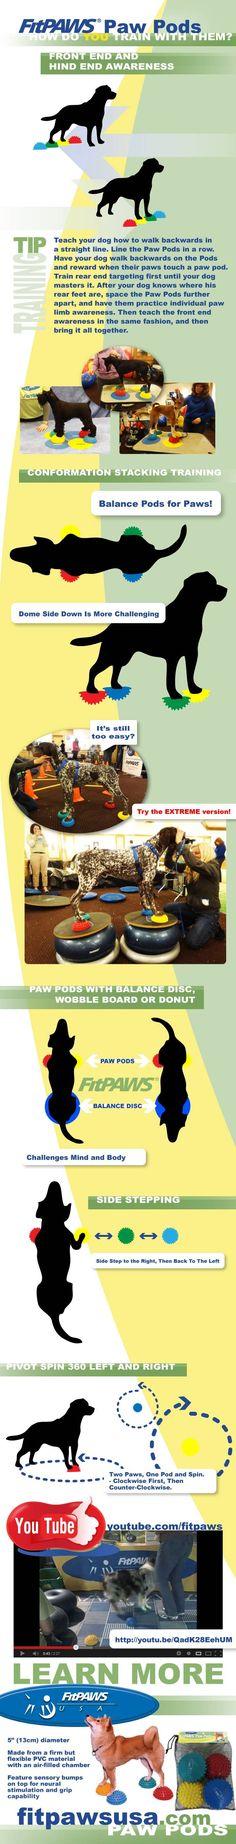 5 Balance Stone Challenges on FitPAWS® Paw Pods - fitpawsusa.com